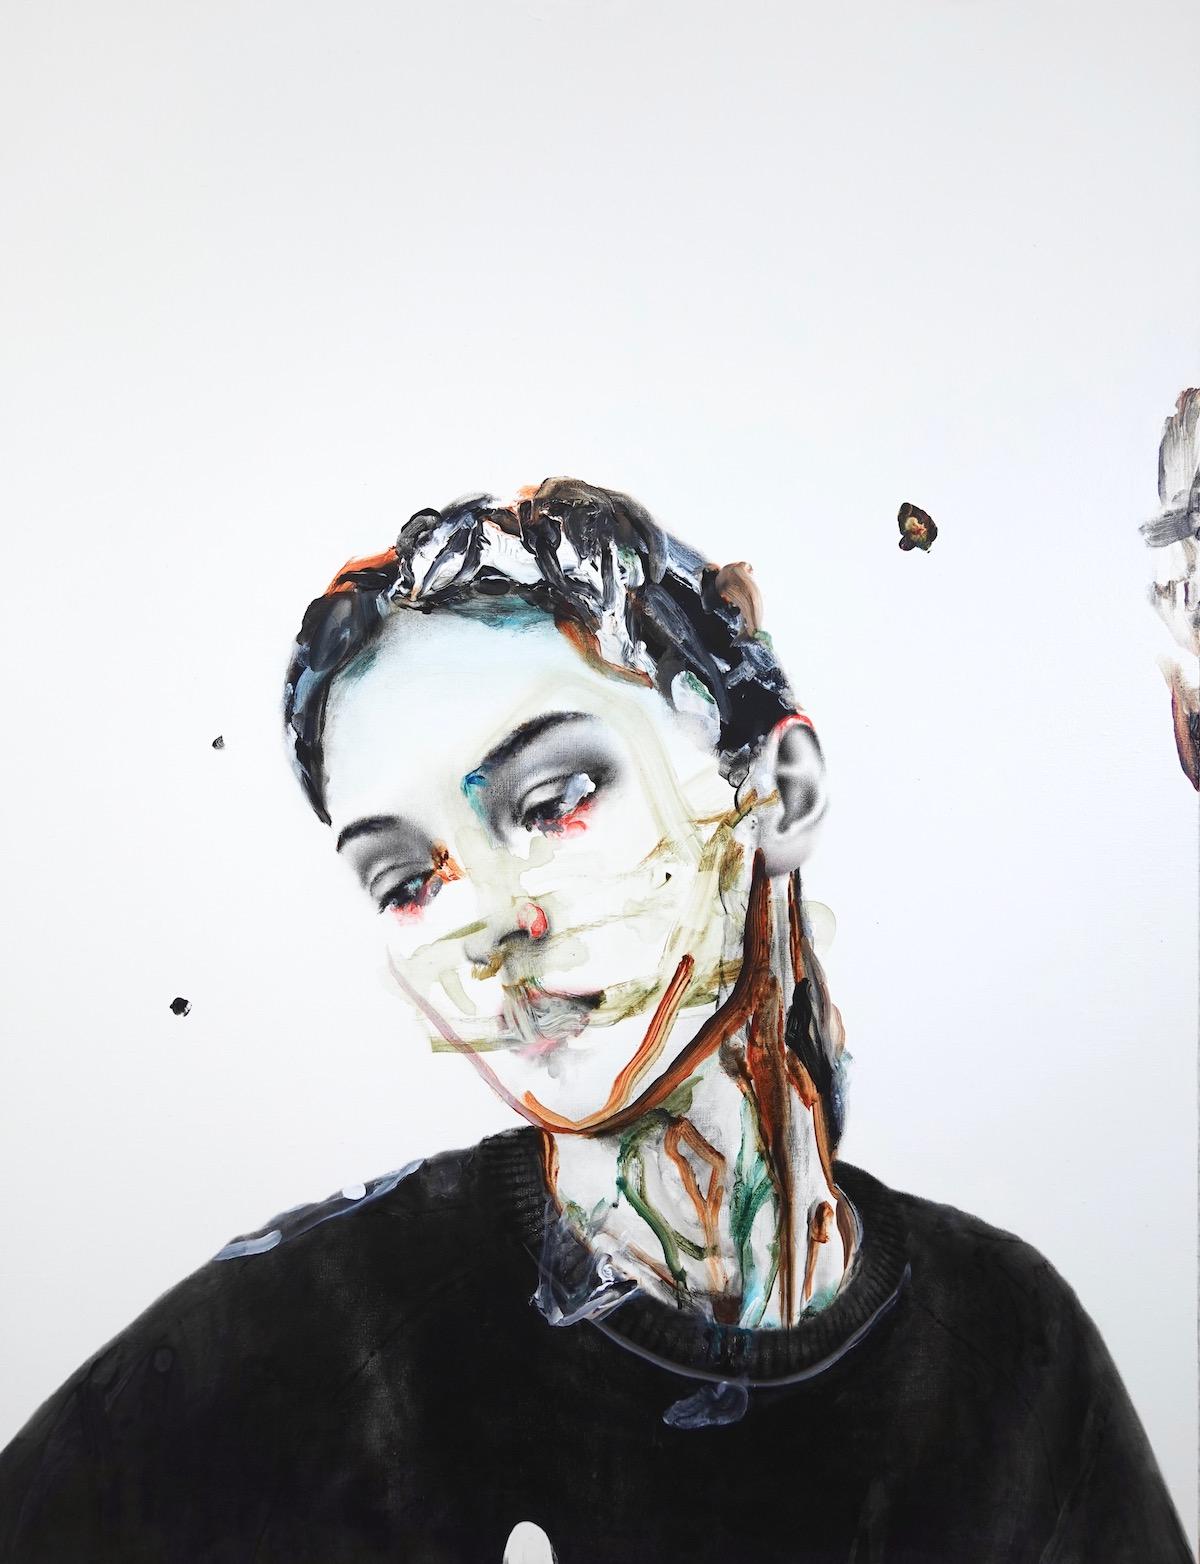 antoine cordet canvas toile peinture painting portrait art artist artiste peintre acrylic oil violence like a rainbow